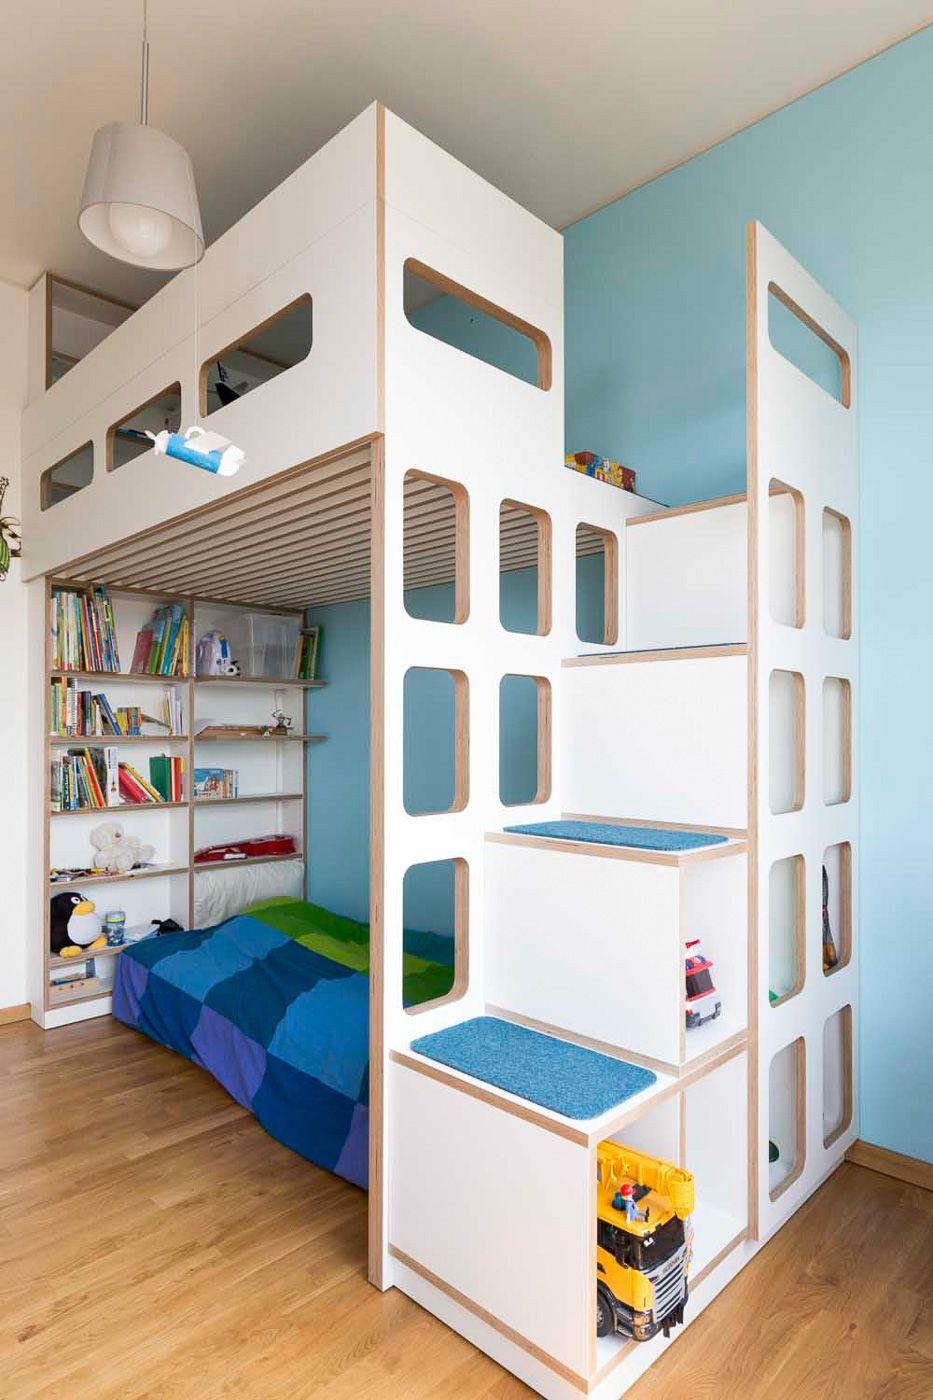 Full Size of Kinderzimmer Regal Regale Weiß Sofa Kinderzimmer Kinderzimmer Hochbett